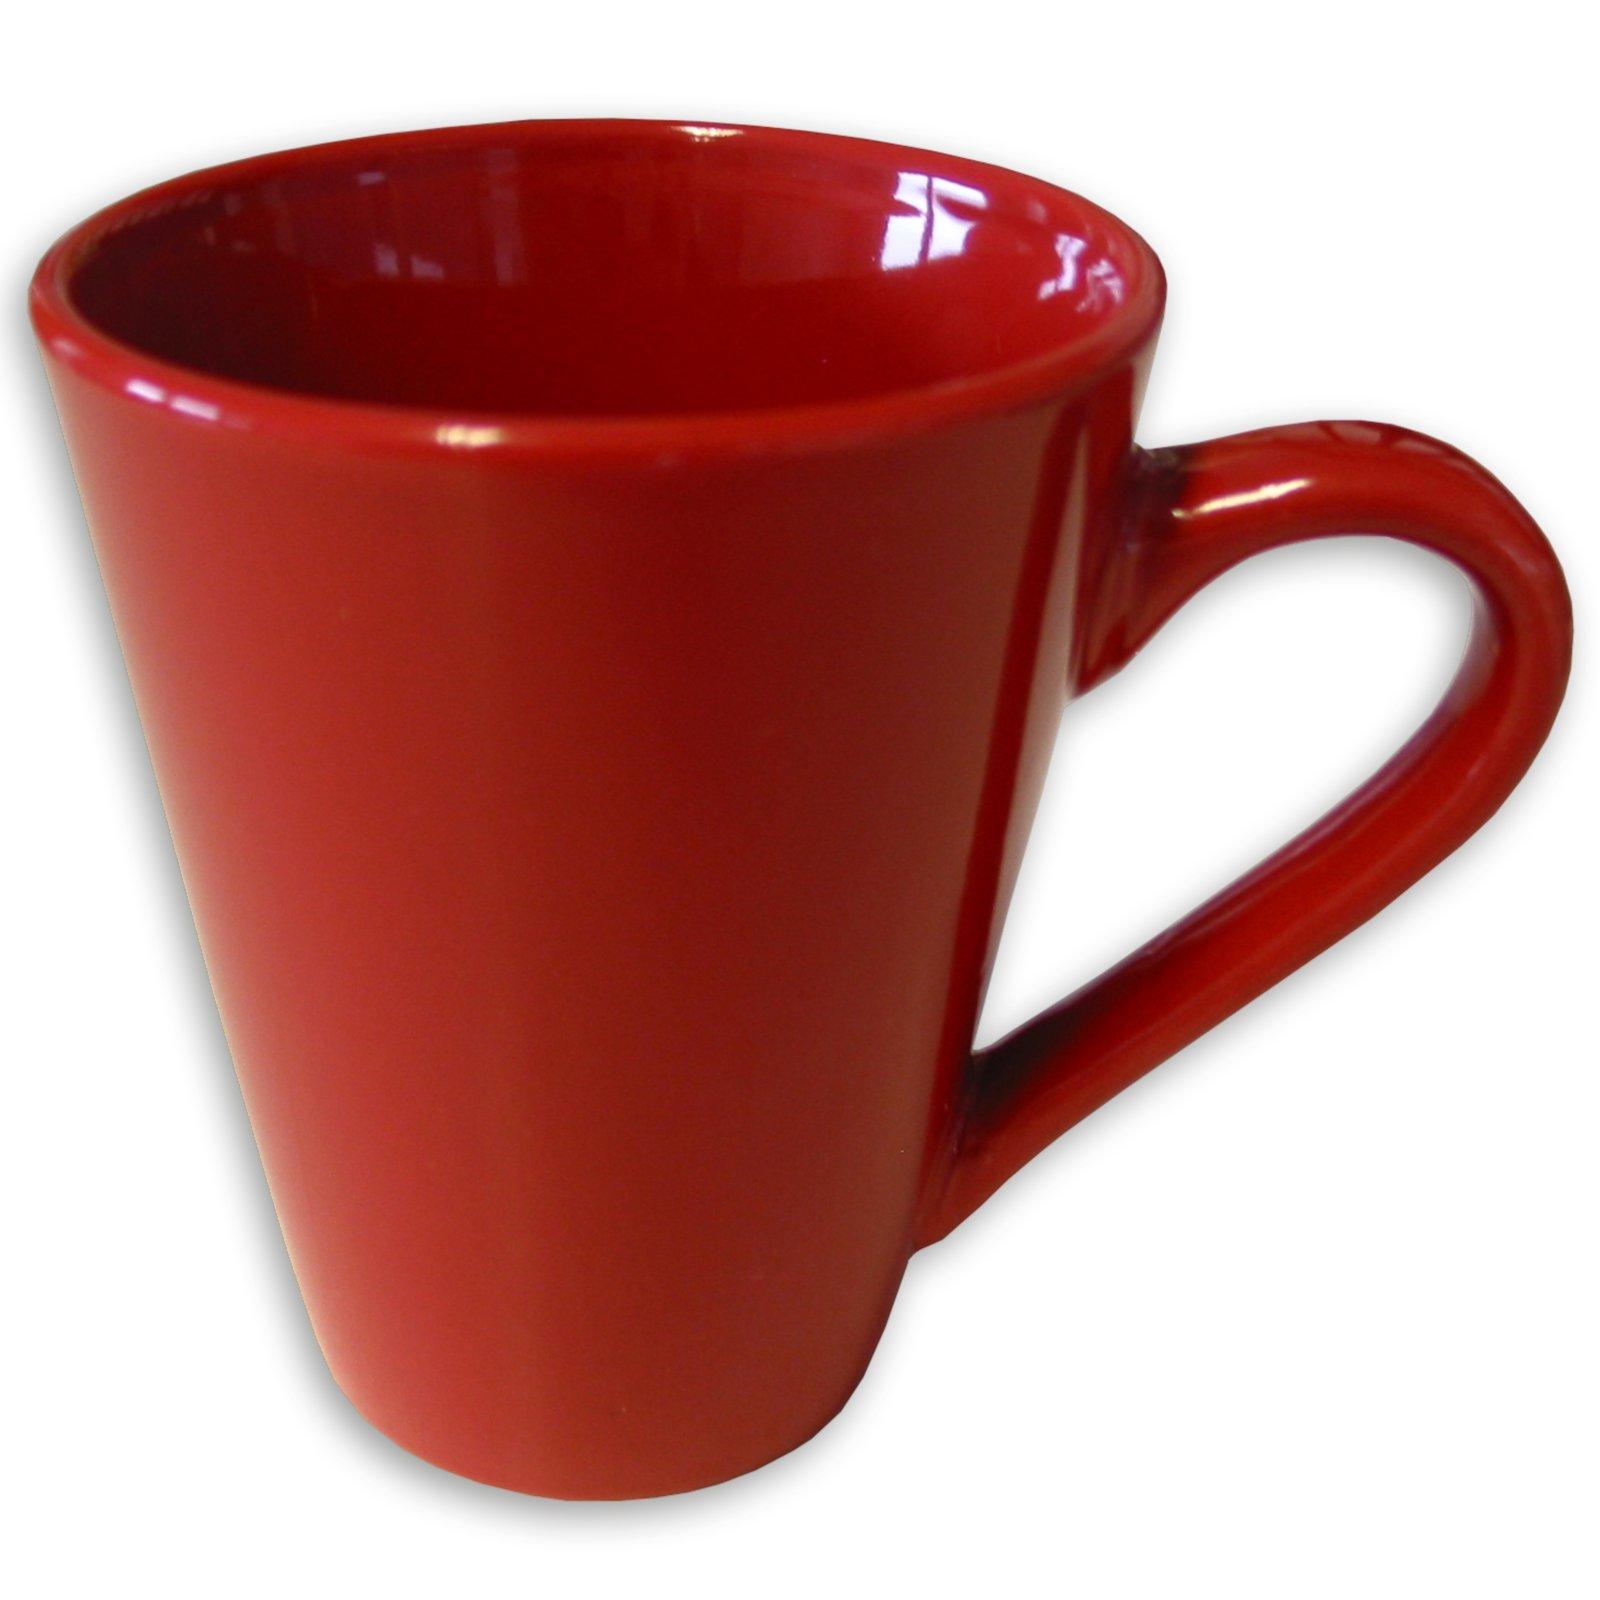 Tasse - rot - Keramik - 280 ml